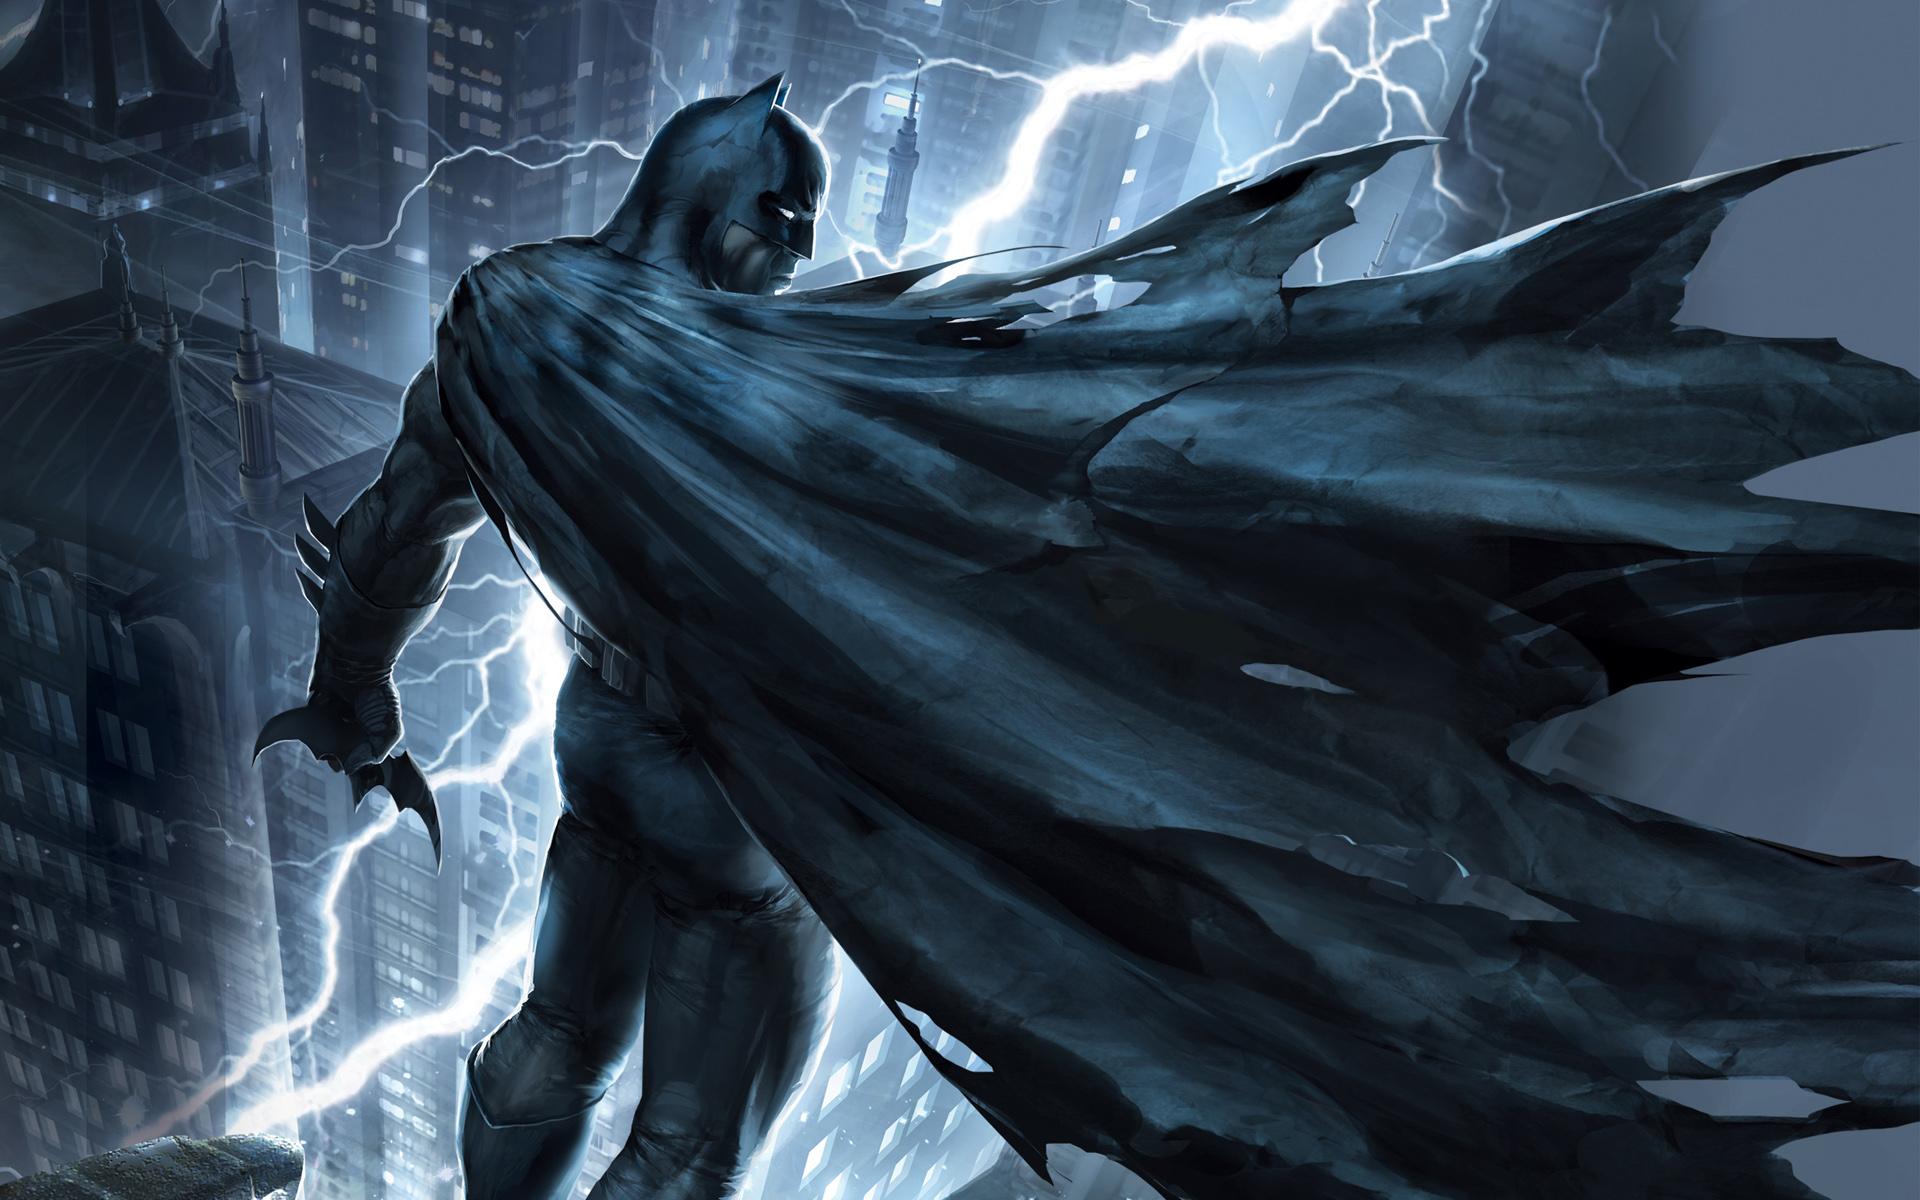 https://i2.wp.com/www.hdwallpapers.in/walls/batman_the_dark_knight_returns_part_1_movie-wide.jpg